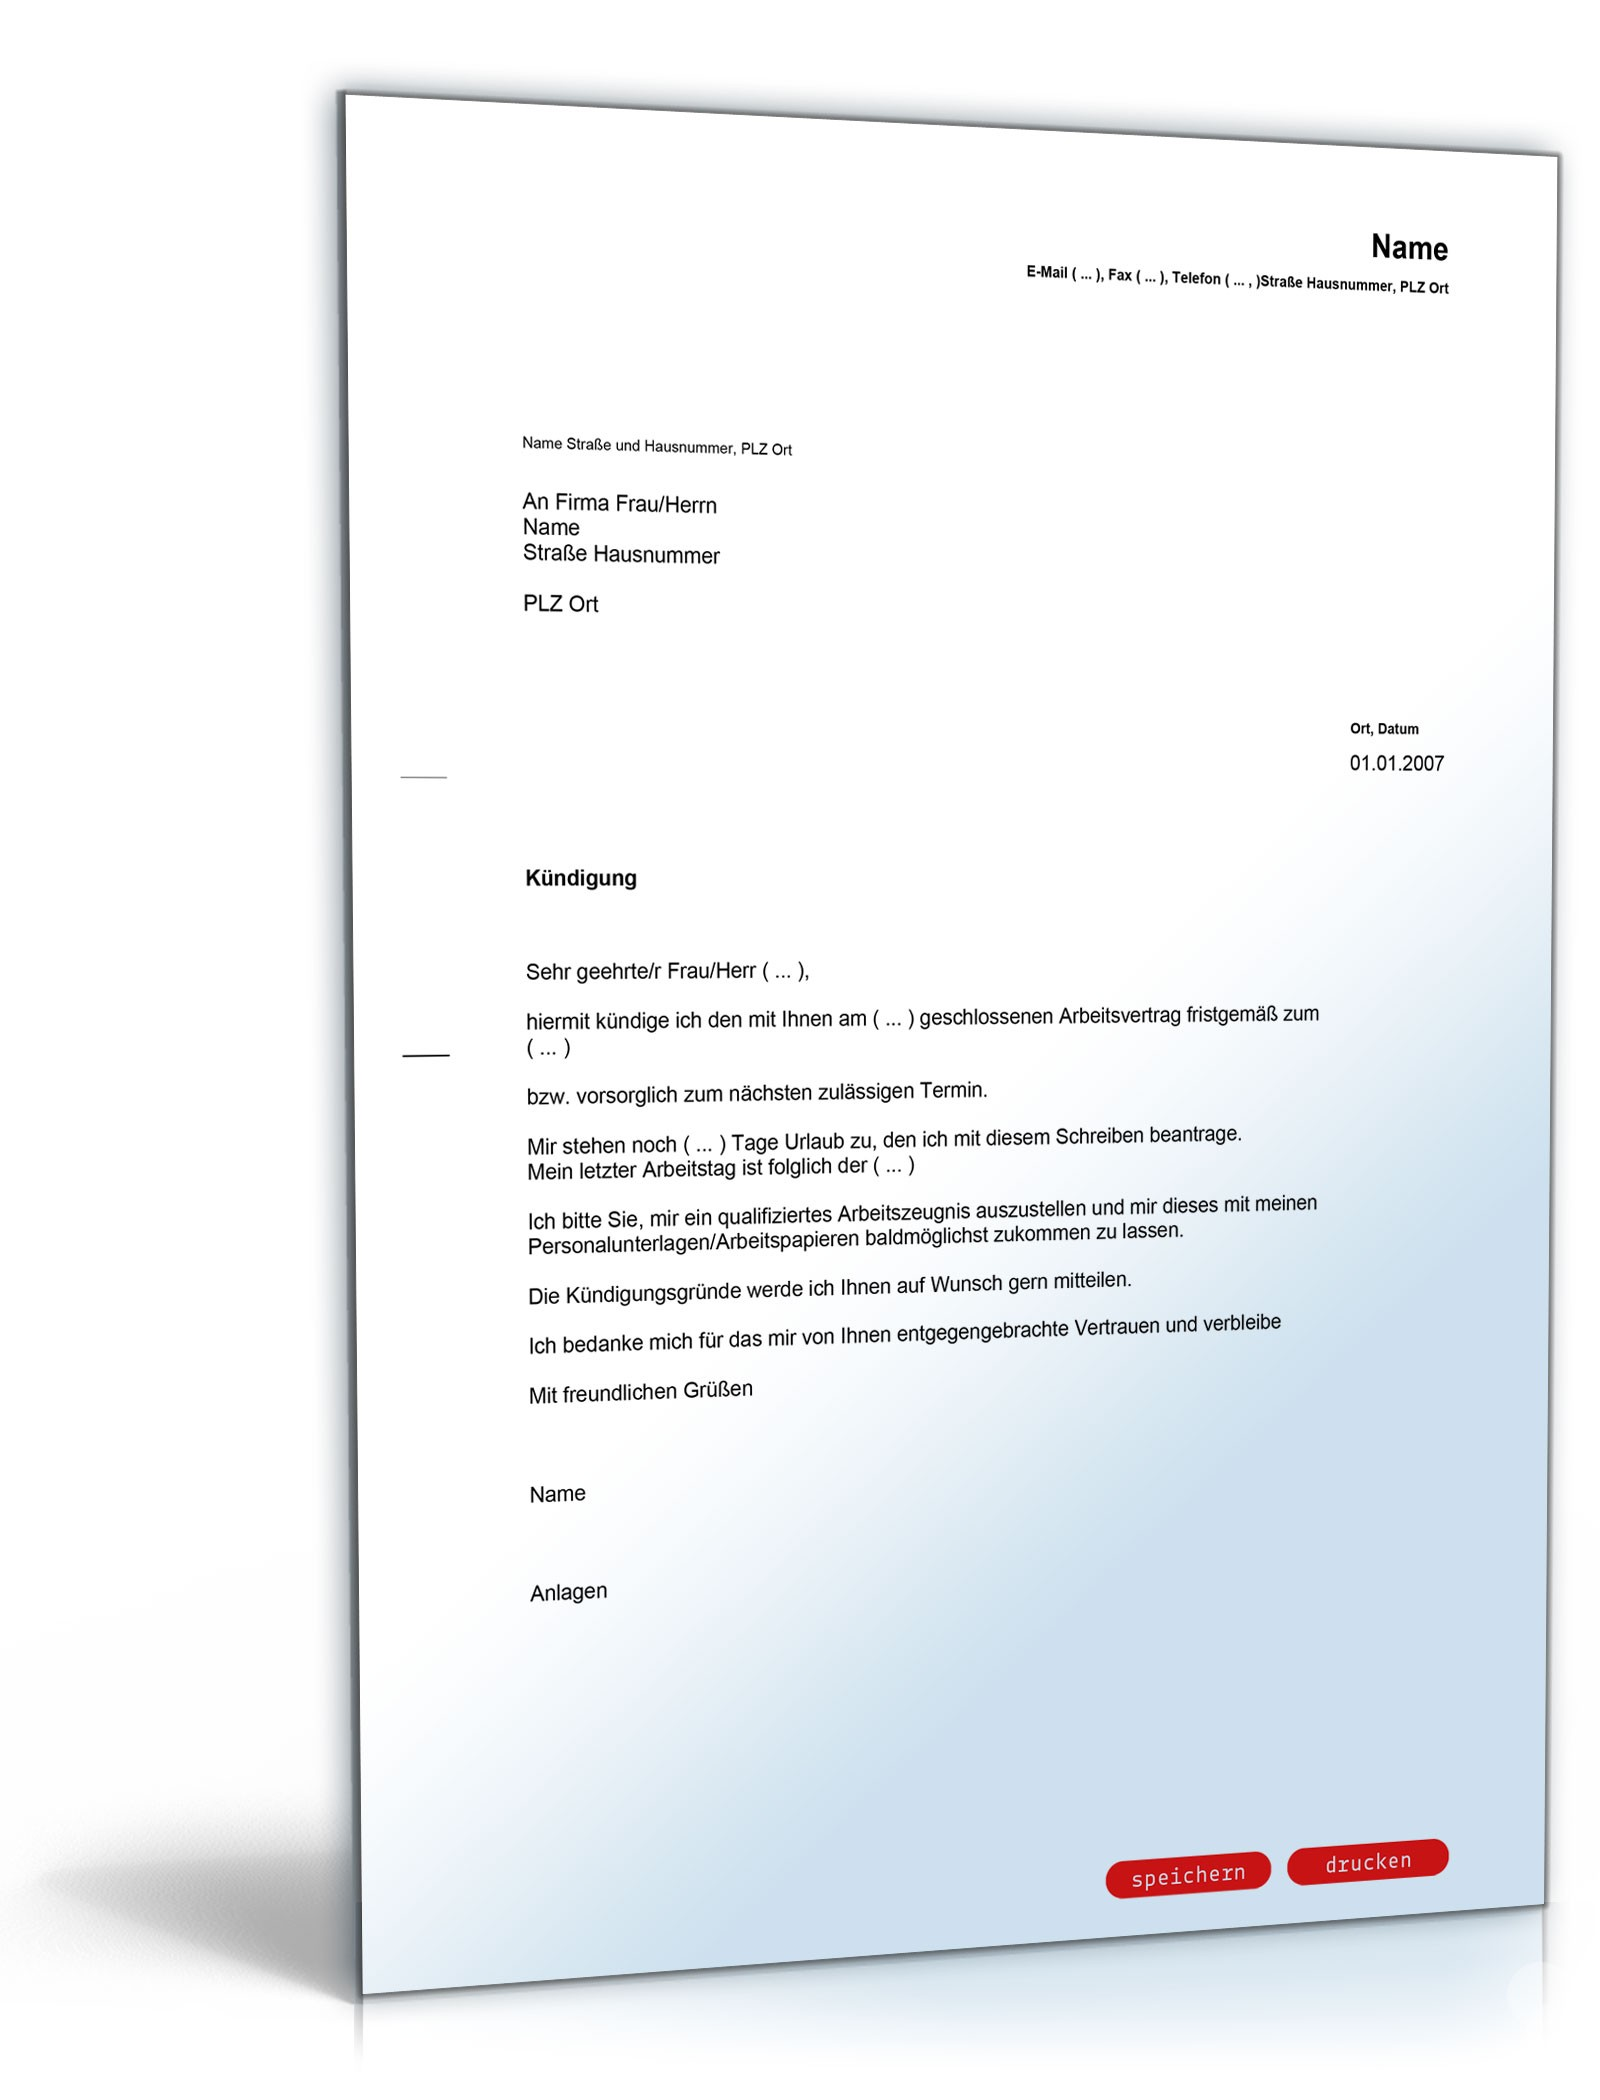 Kündigung Arbeitsvertrag Fristgemäß Arbeitnehmer Muster Vorlage